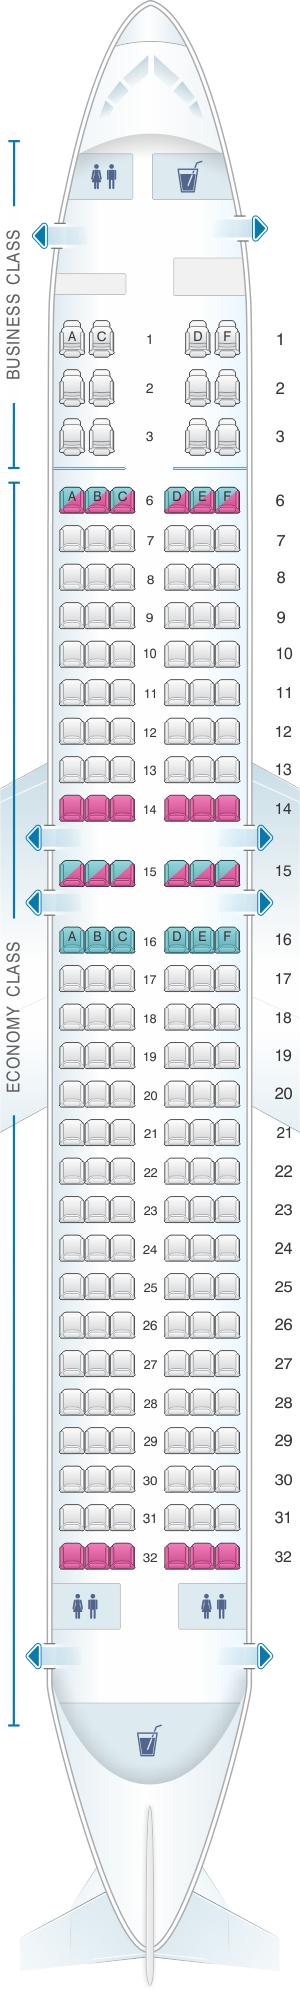 Seat Map Flydubai Boeing B737 800 Config. 2 Kingfisher